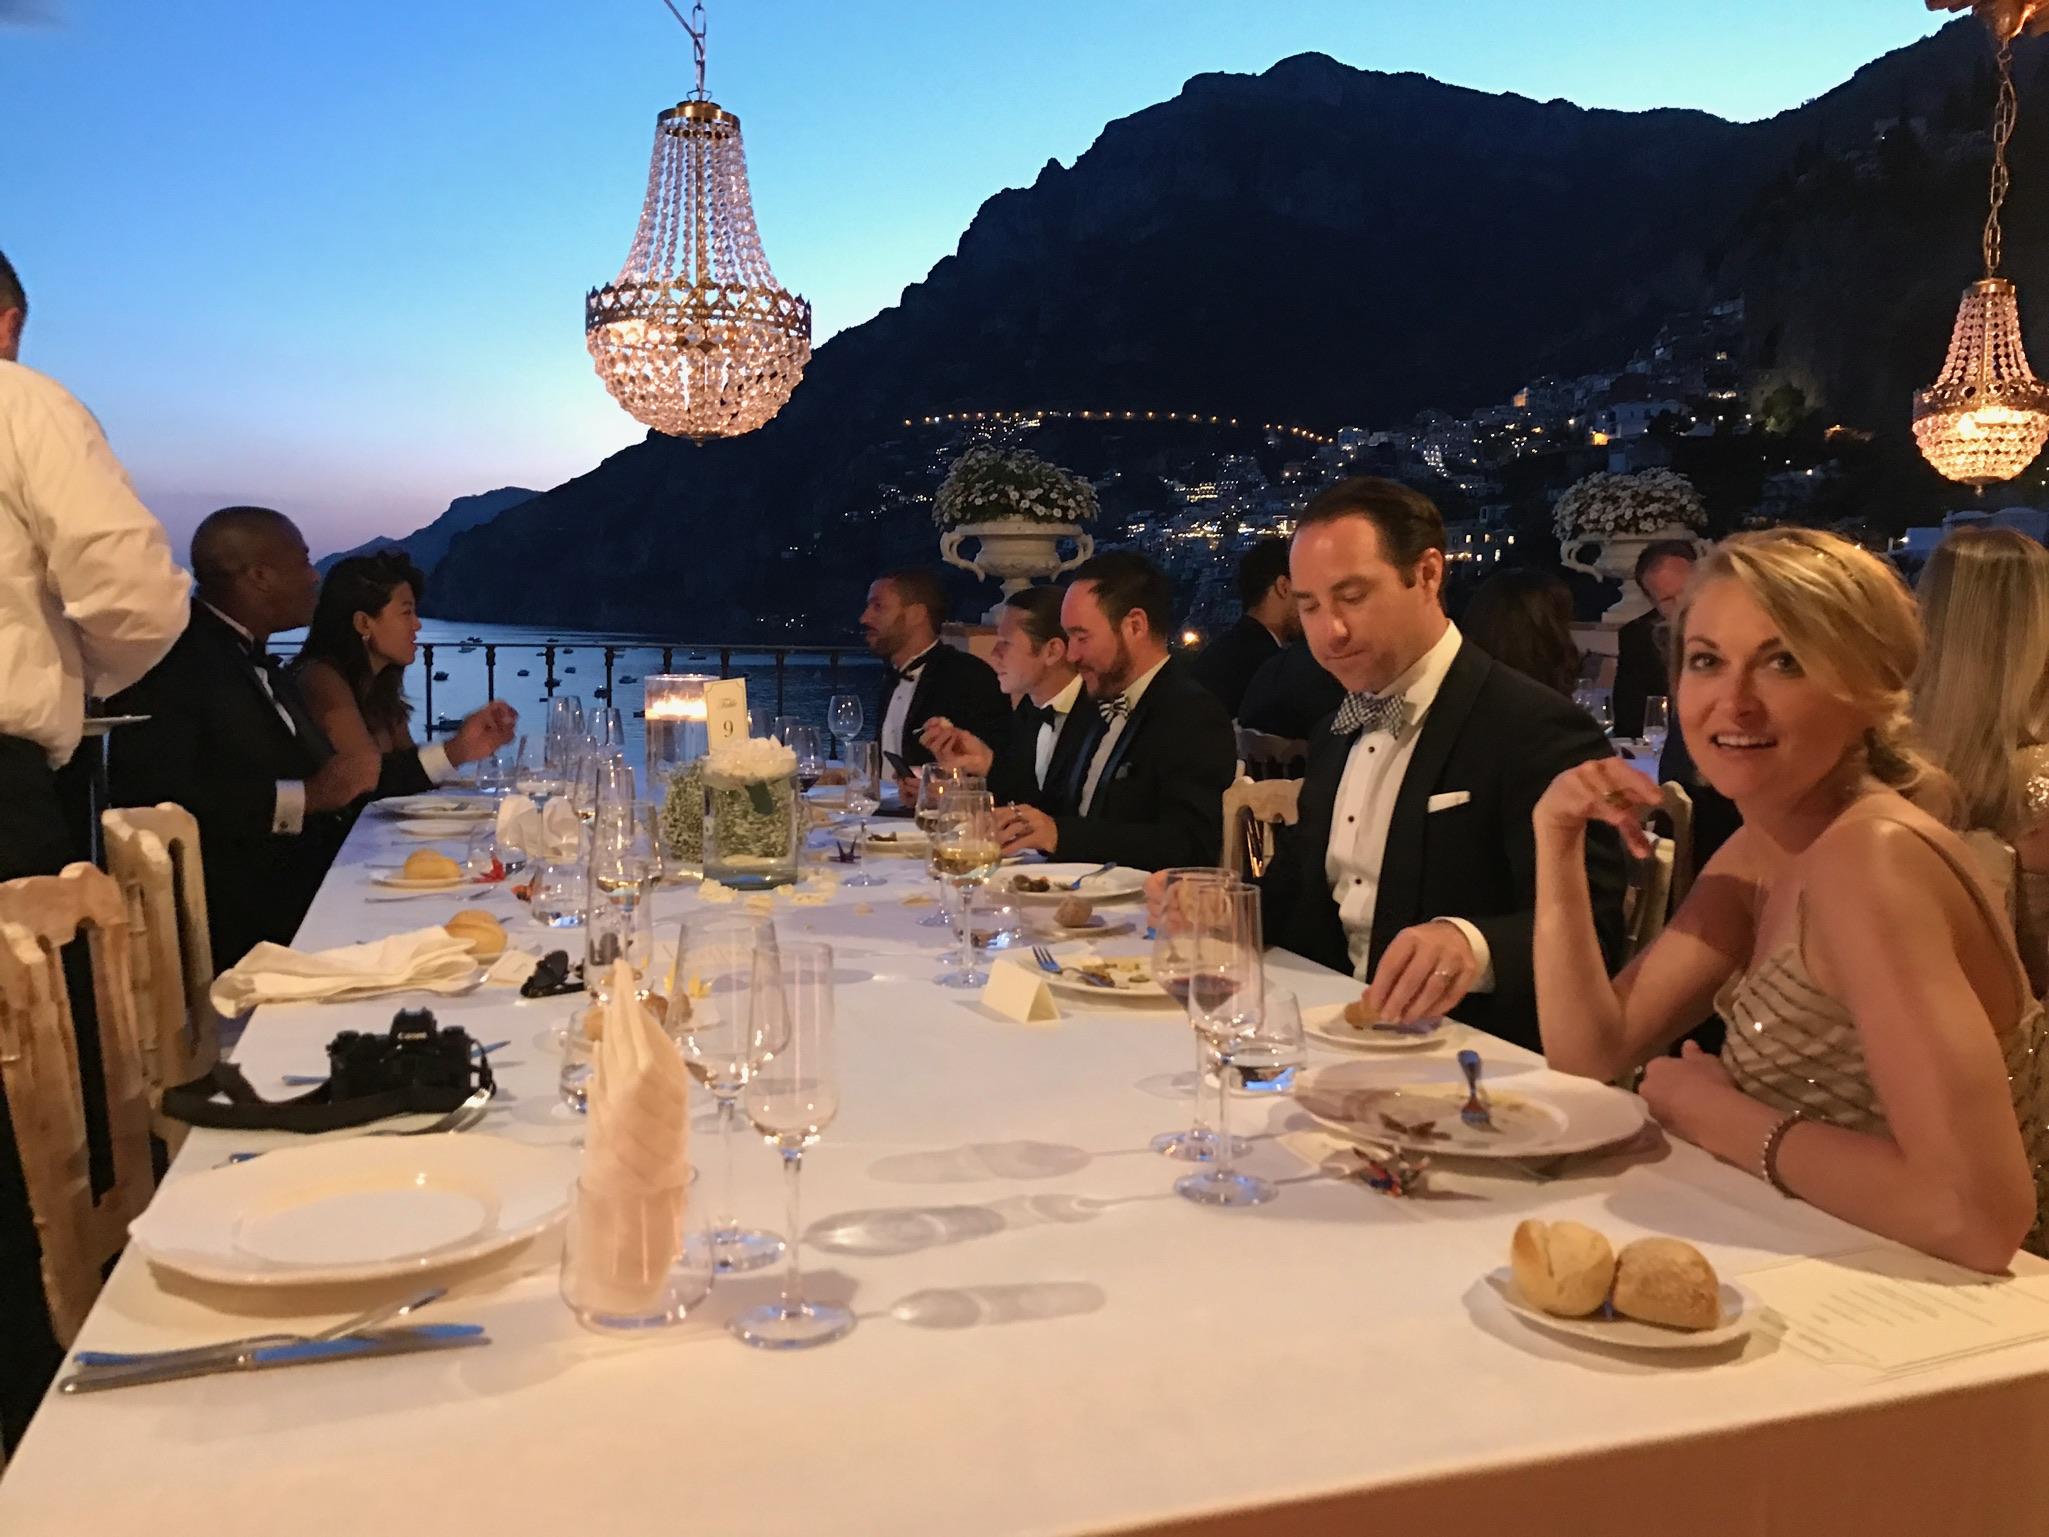 https://www.weddingamalfi.com/wp-content/uploads/Nathalie-and-Benjamin-Wedding-in-Positano-Italy-14.jpg